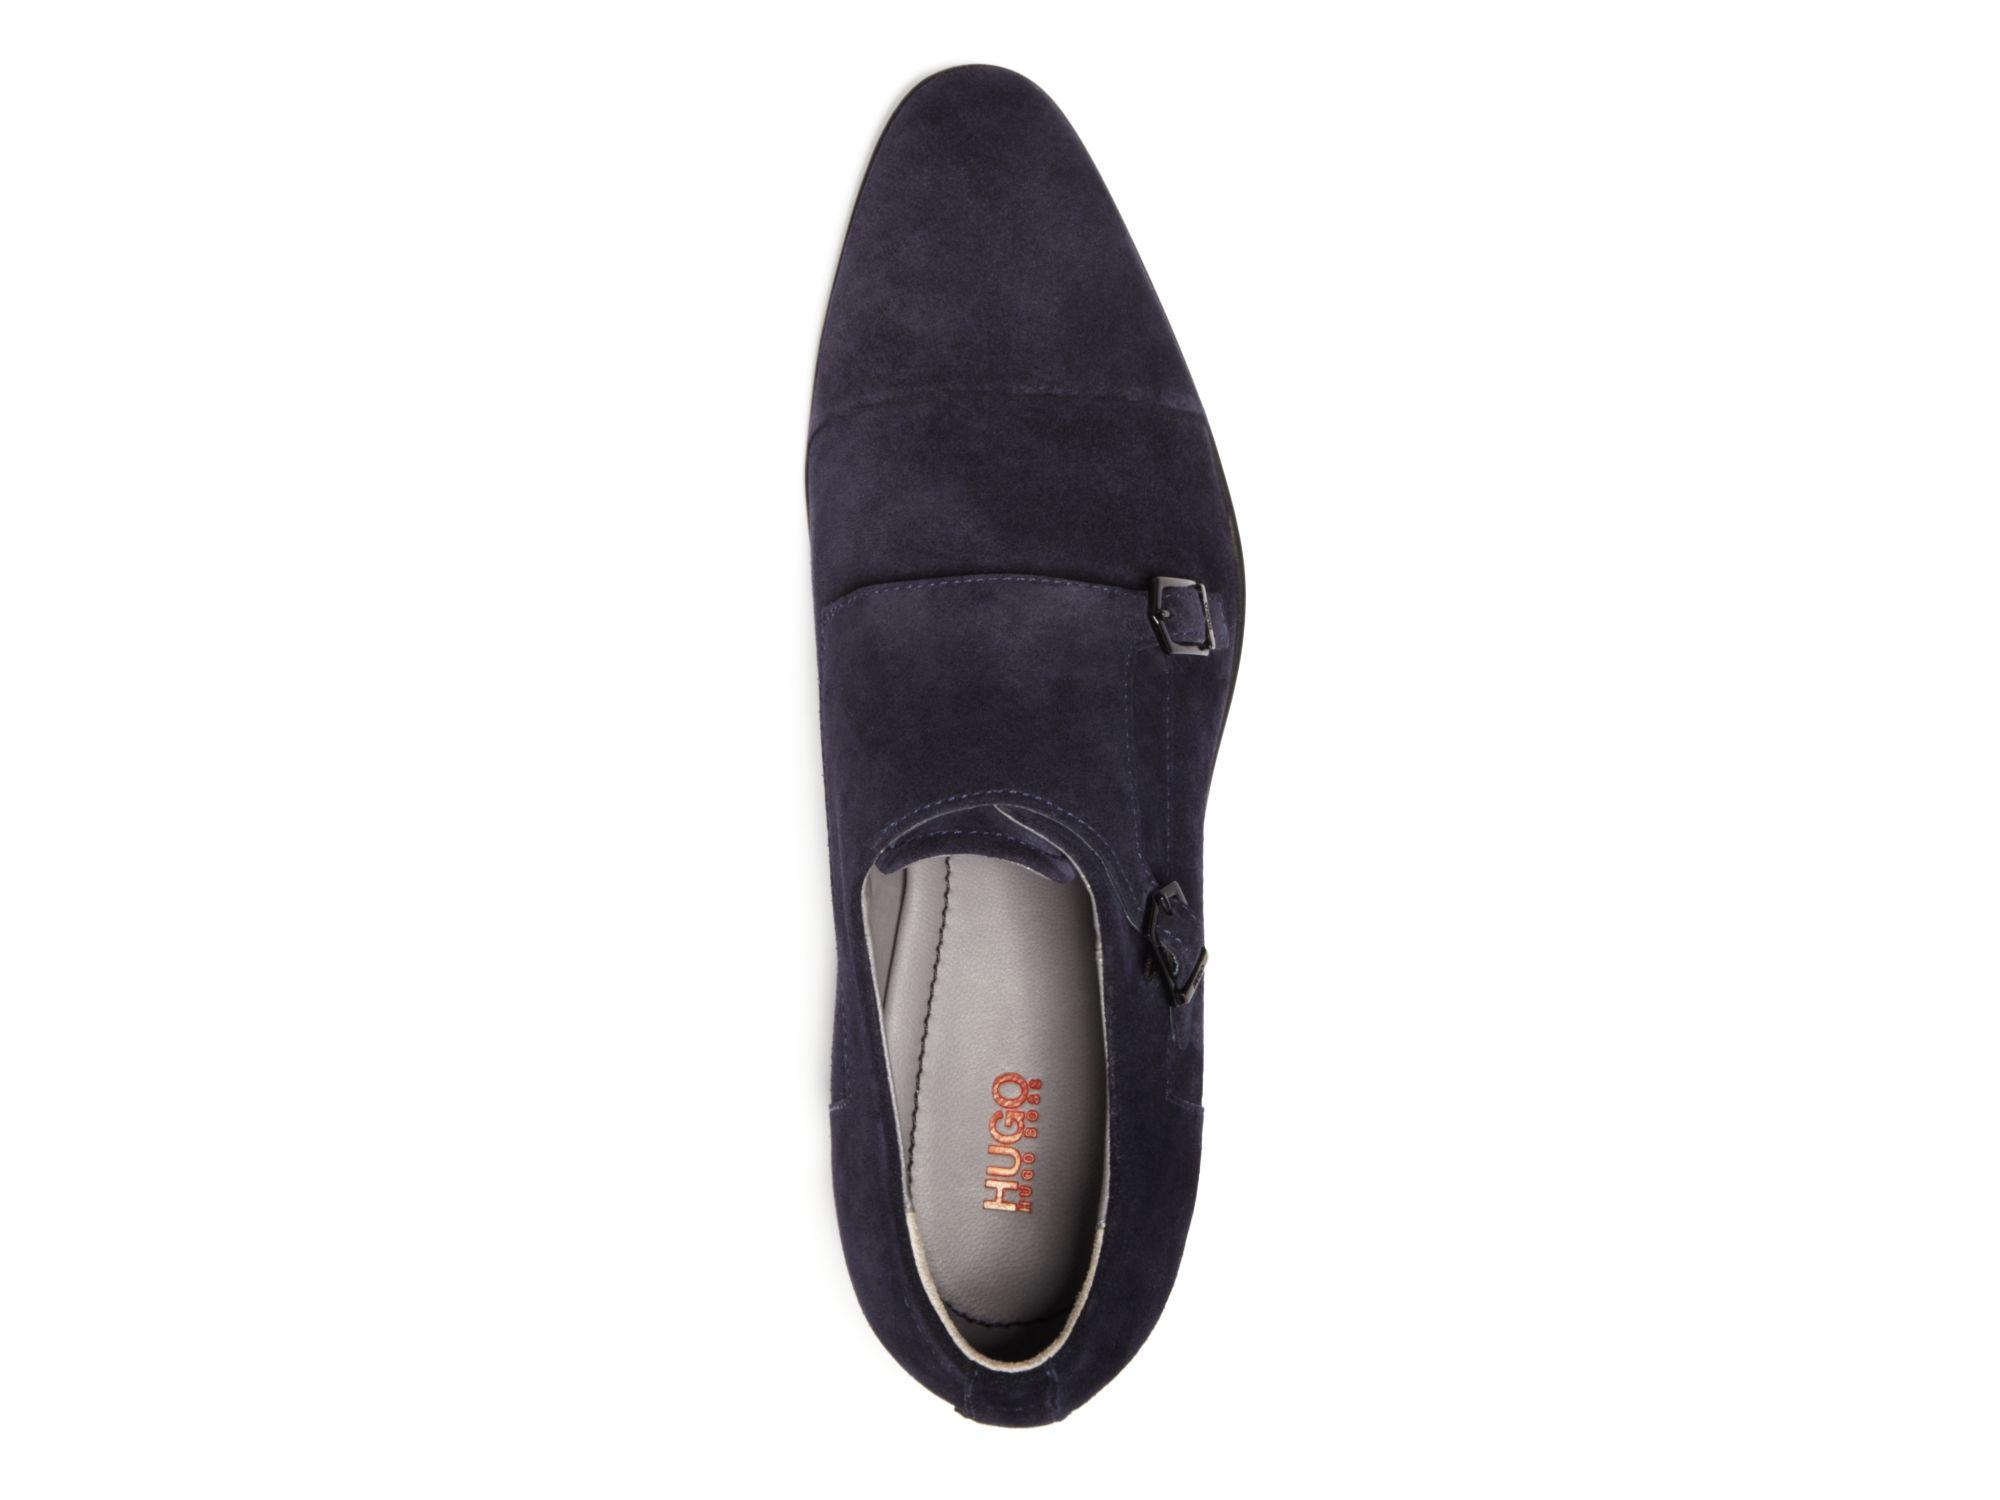 Hugo Boss Leather Monk Shoes